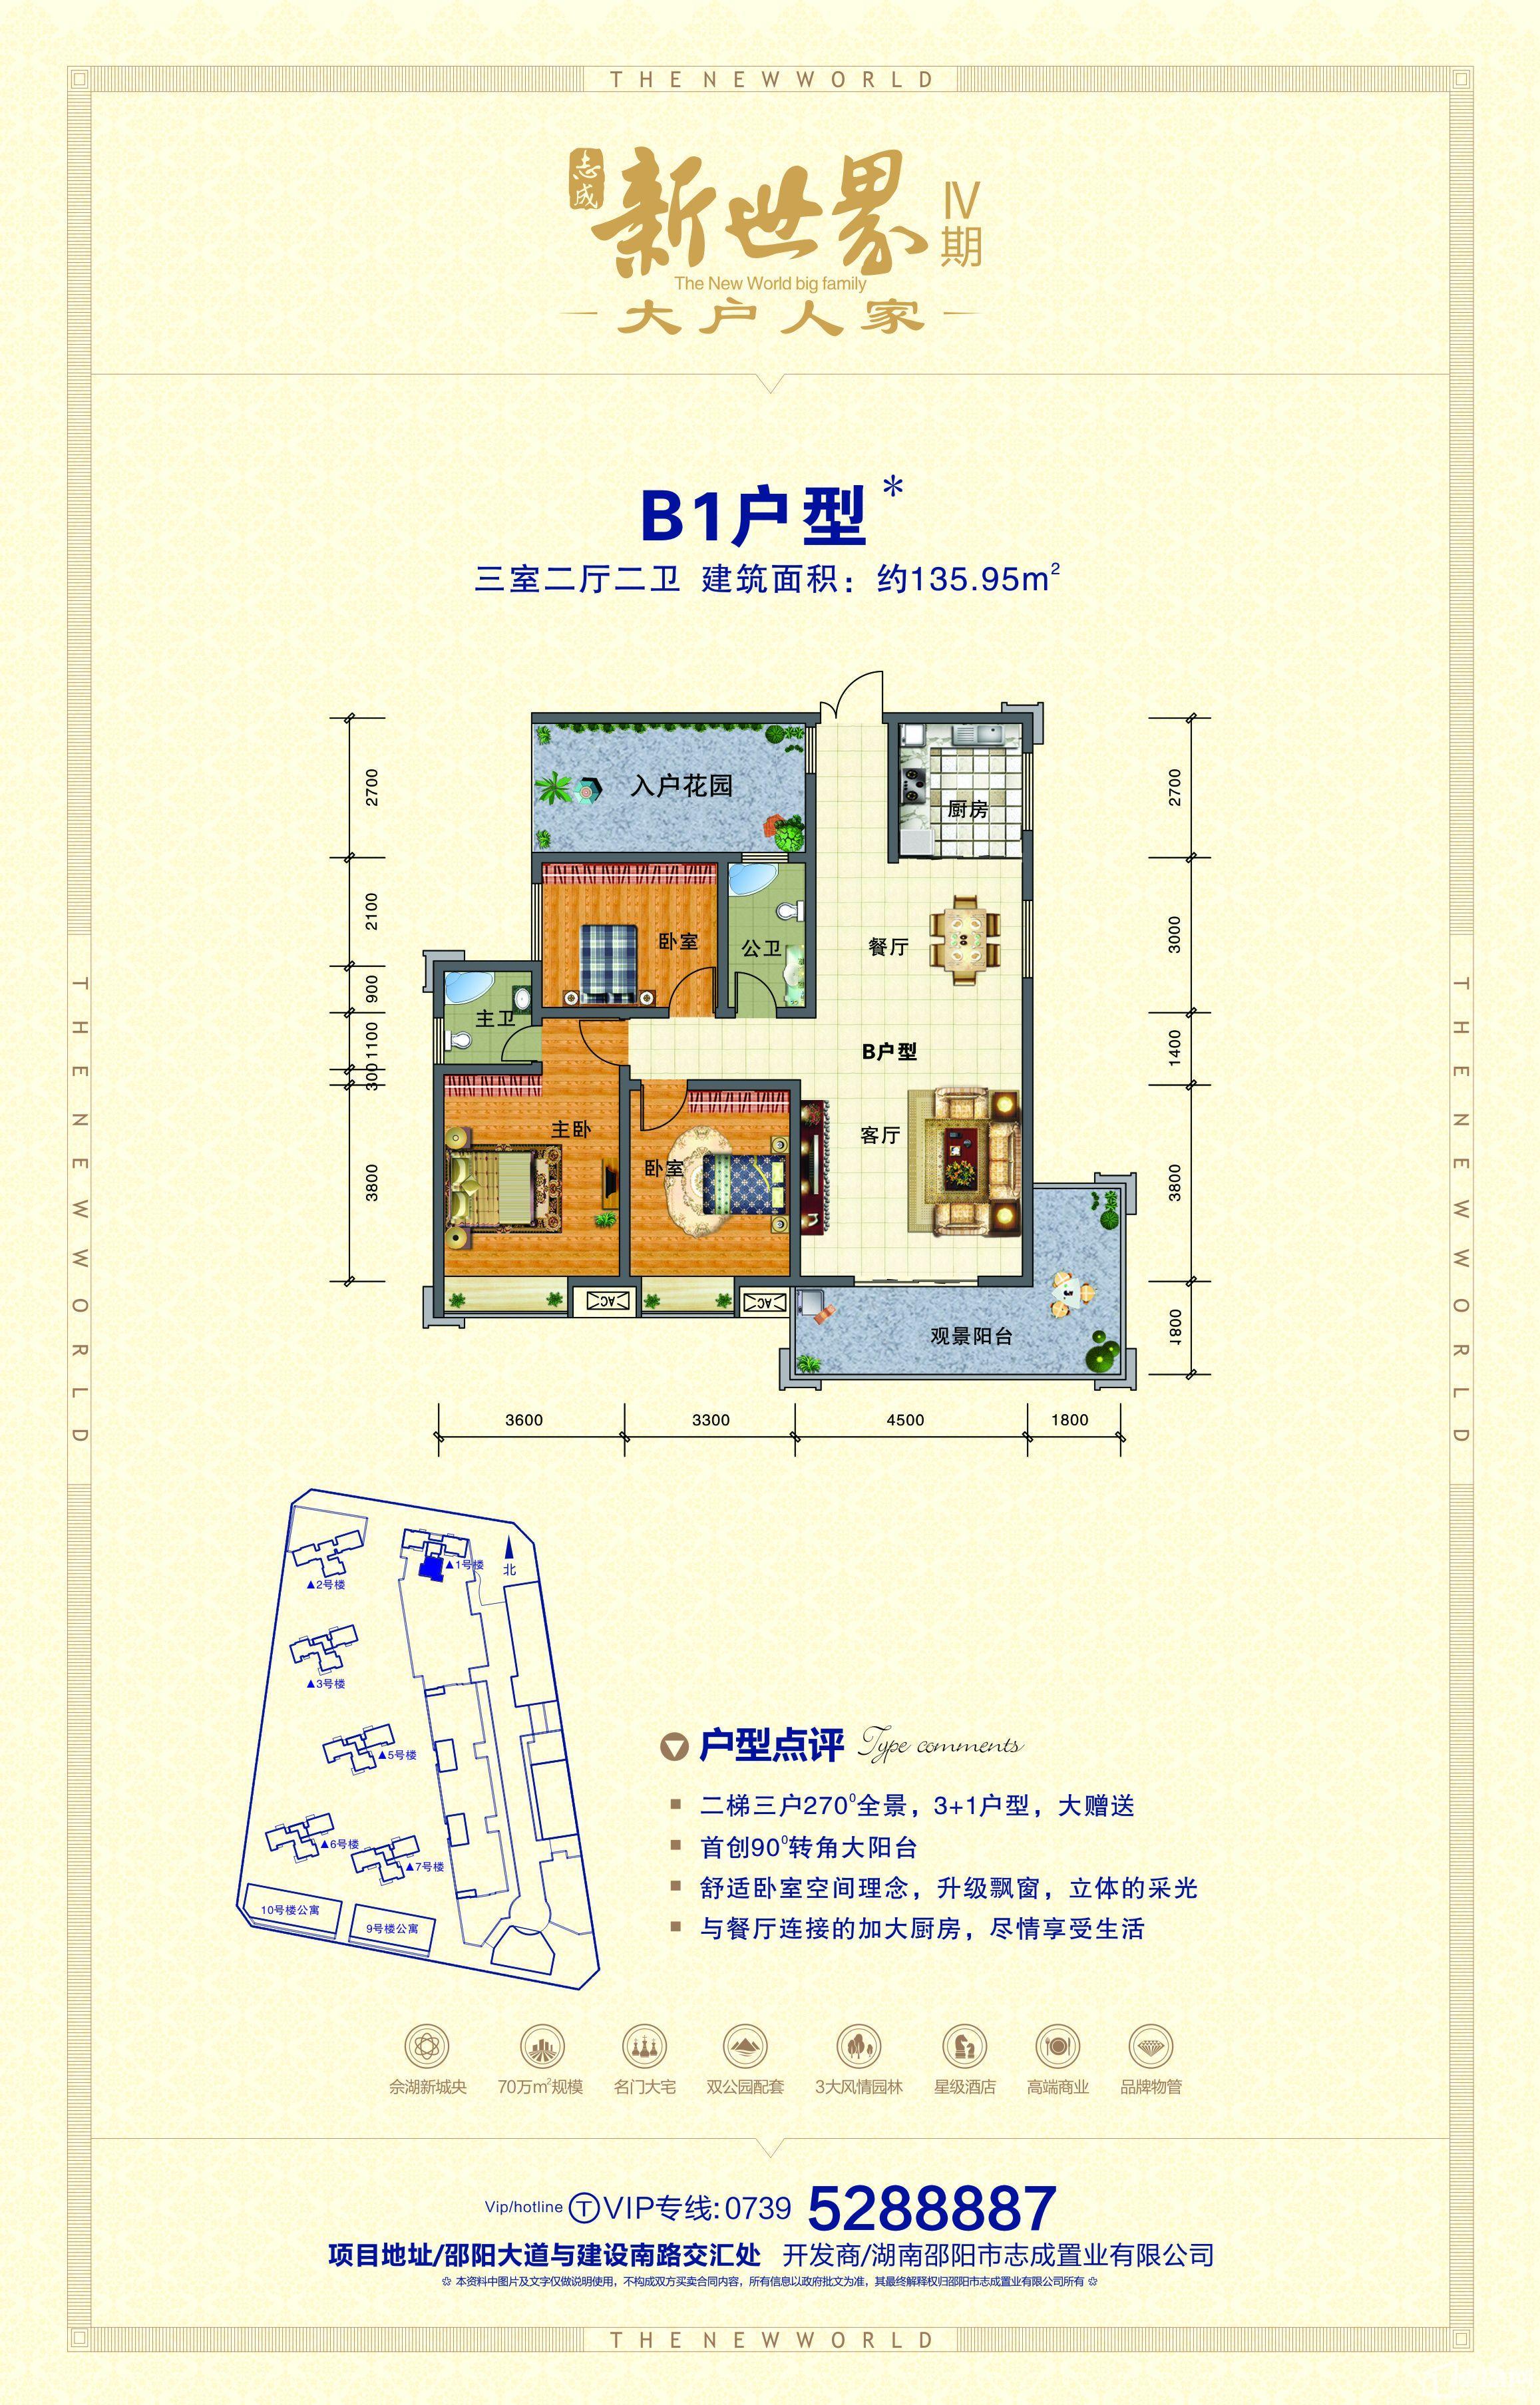 B1-1户型图